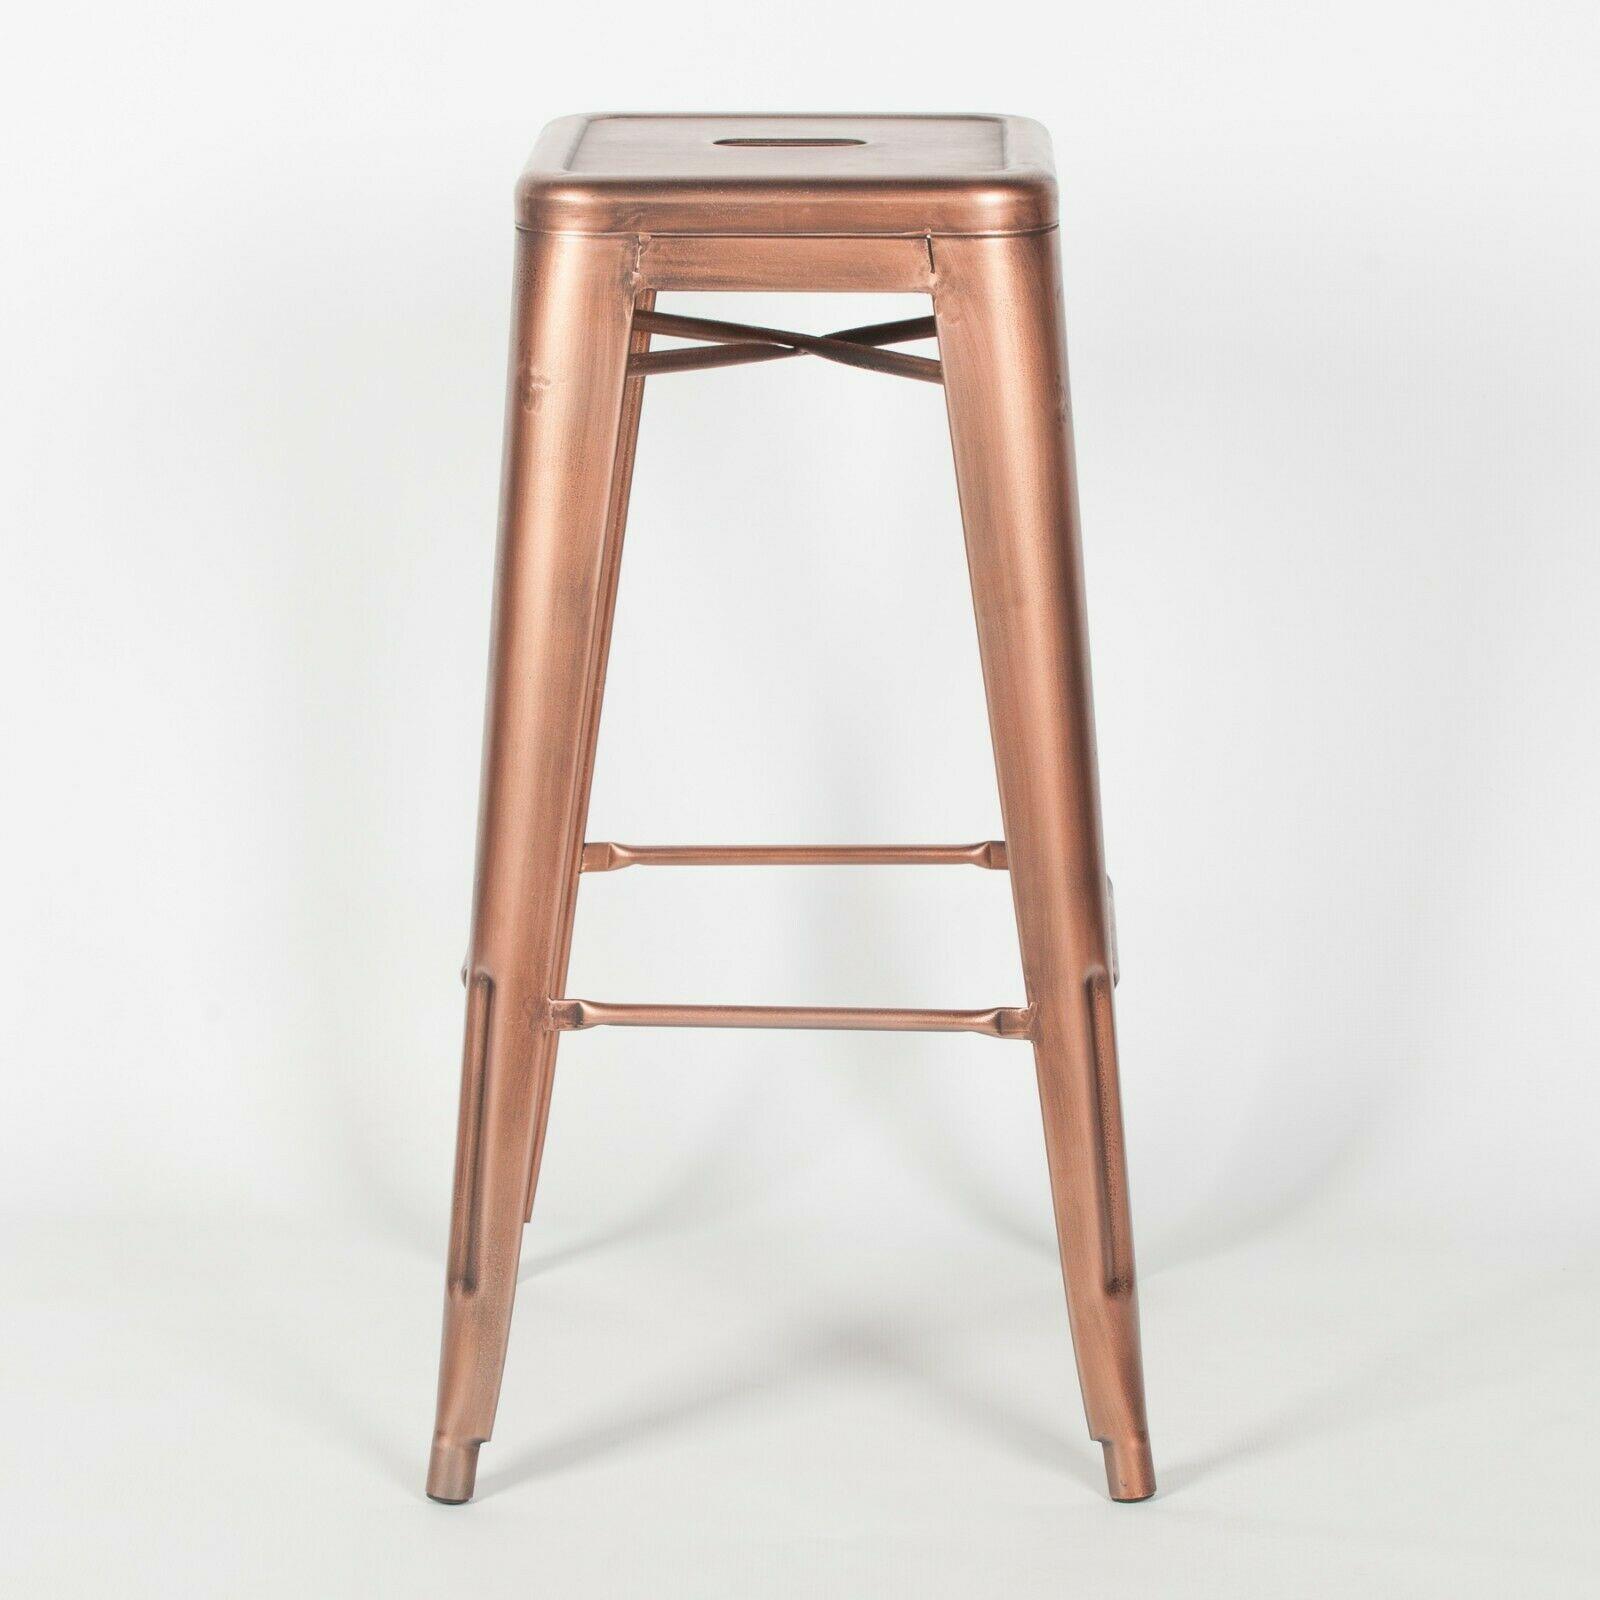 Tolix Inspired Vintage Copper Rose Gold Bar Stool Furniture La Maison Chic Luxury Interiors